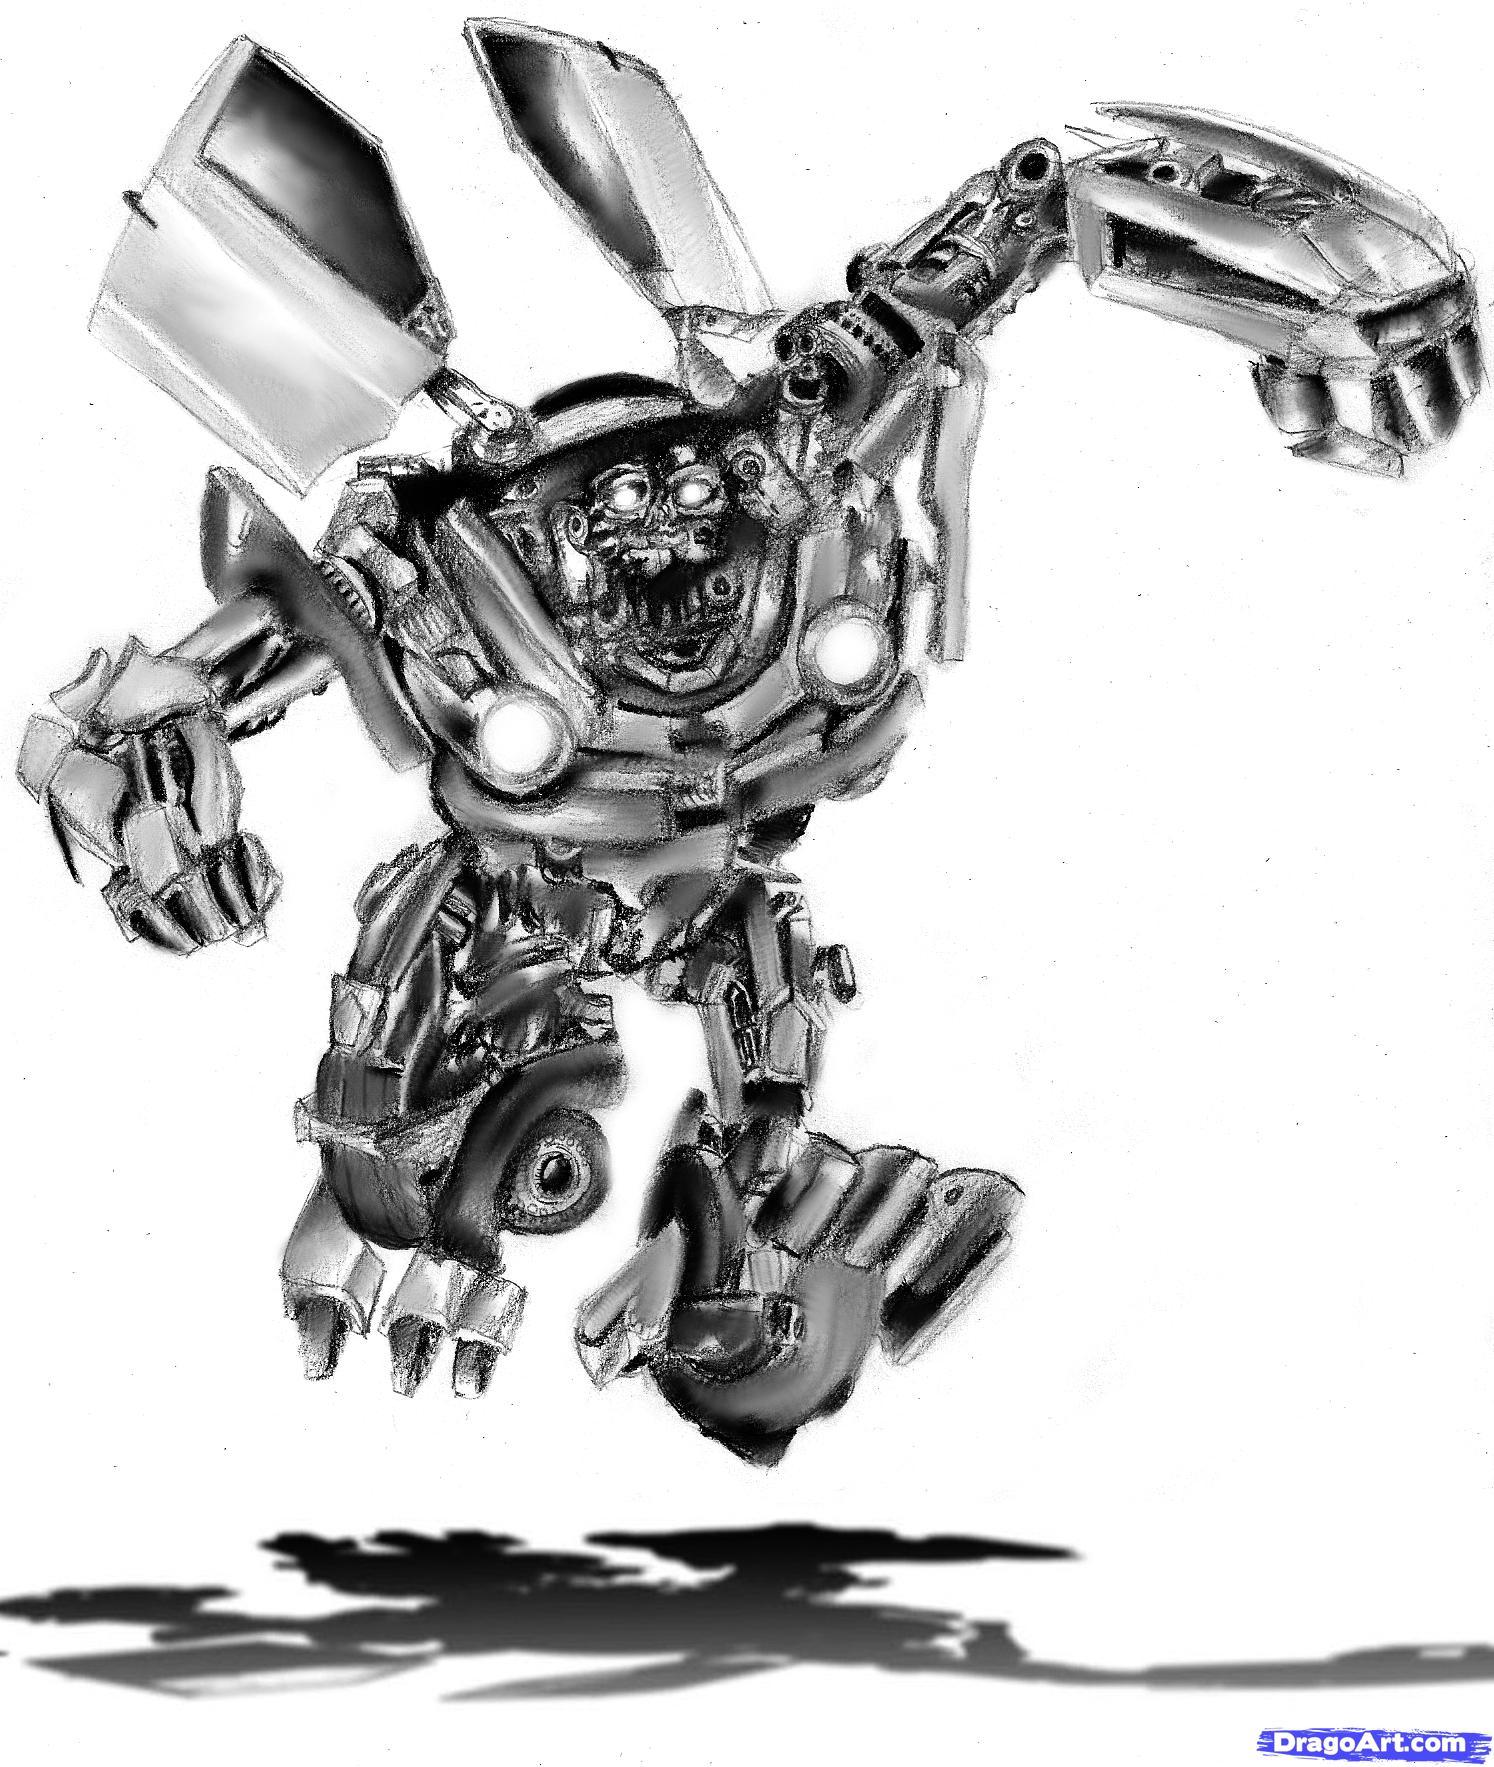 Drawn transformers Drawing Transformers Characters Transformers transformers from how 2